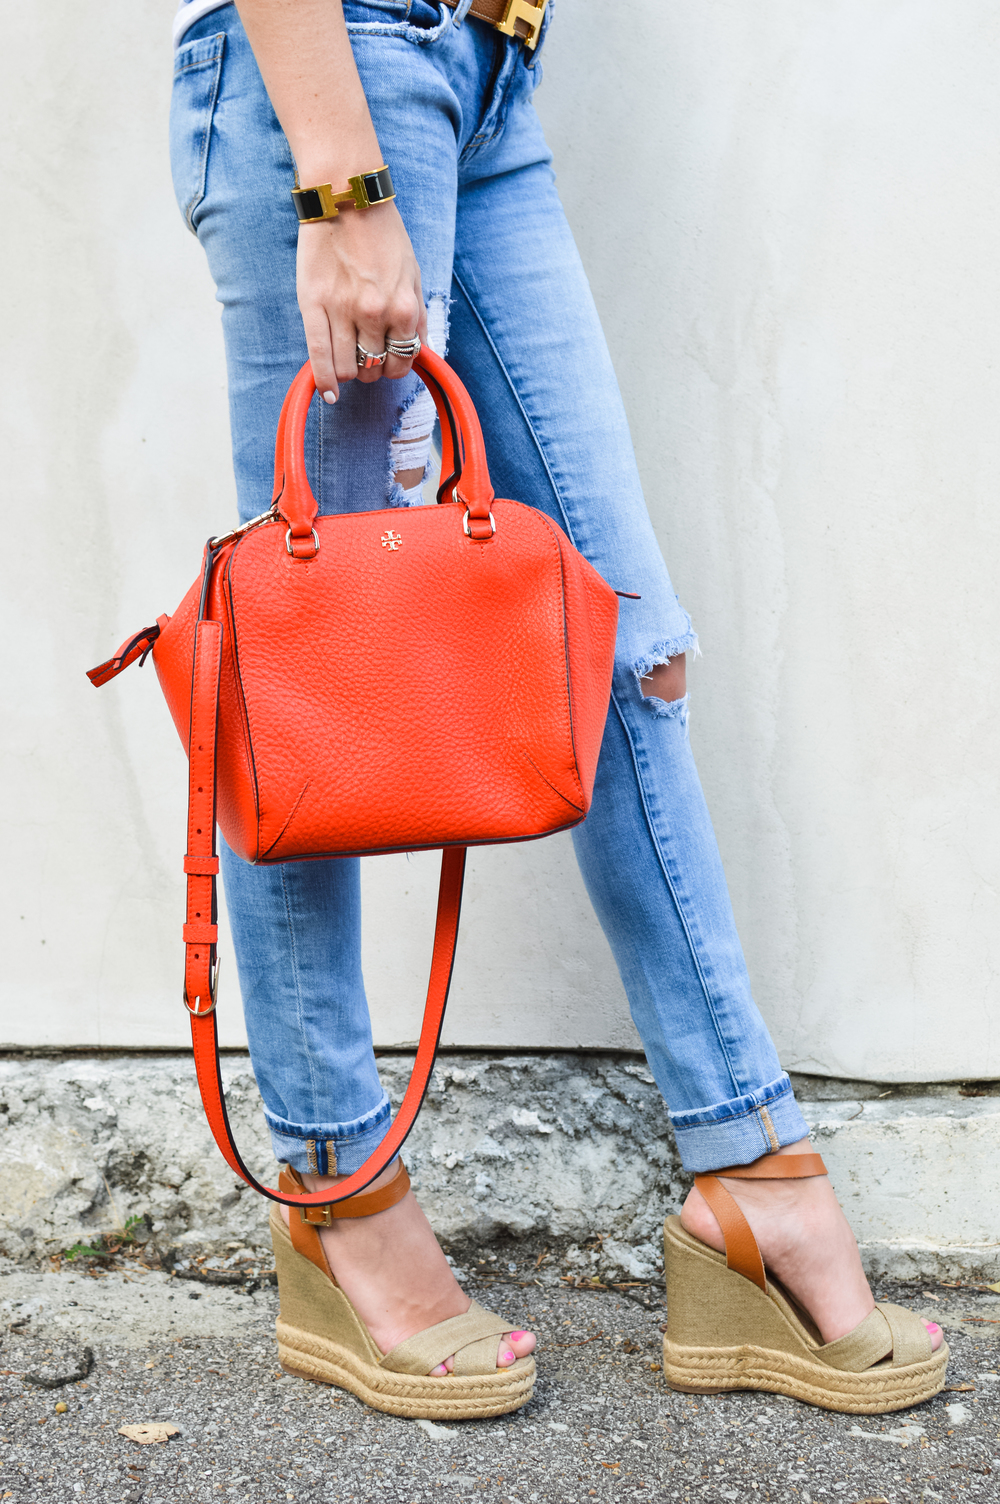 lcb_style_fashion_blogger_tory burch top (23 of 29).jpg